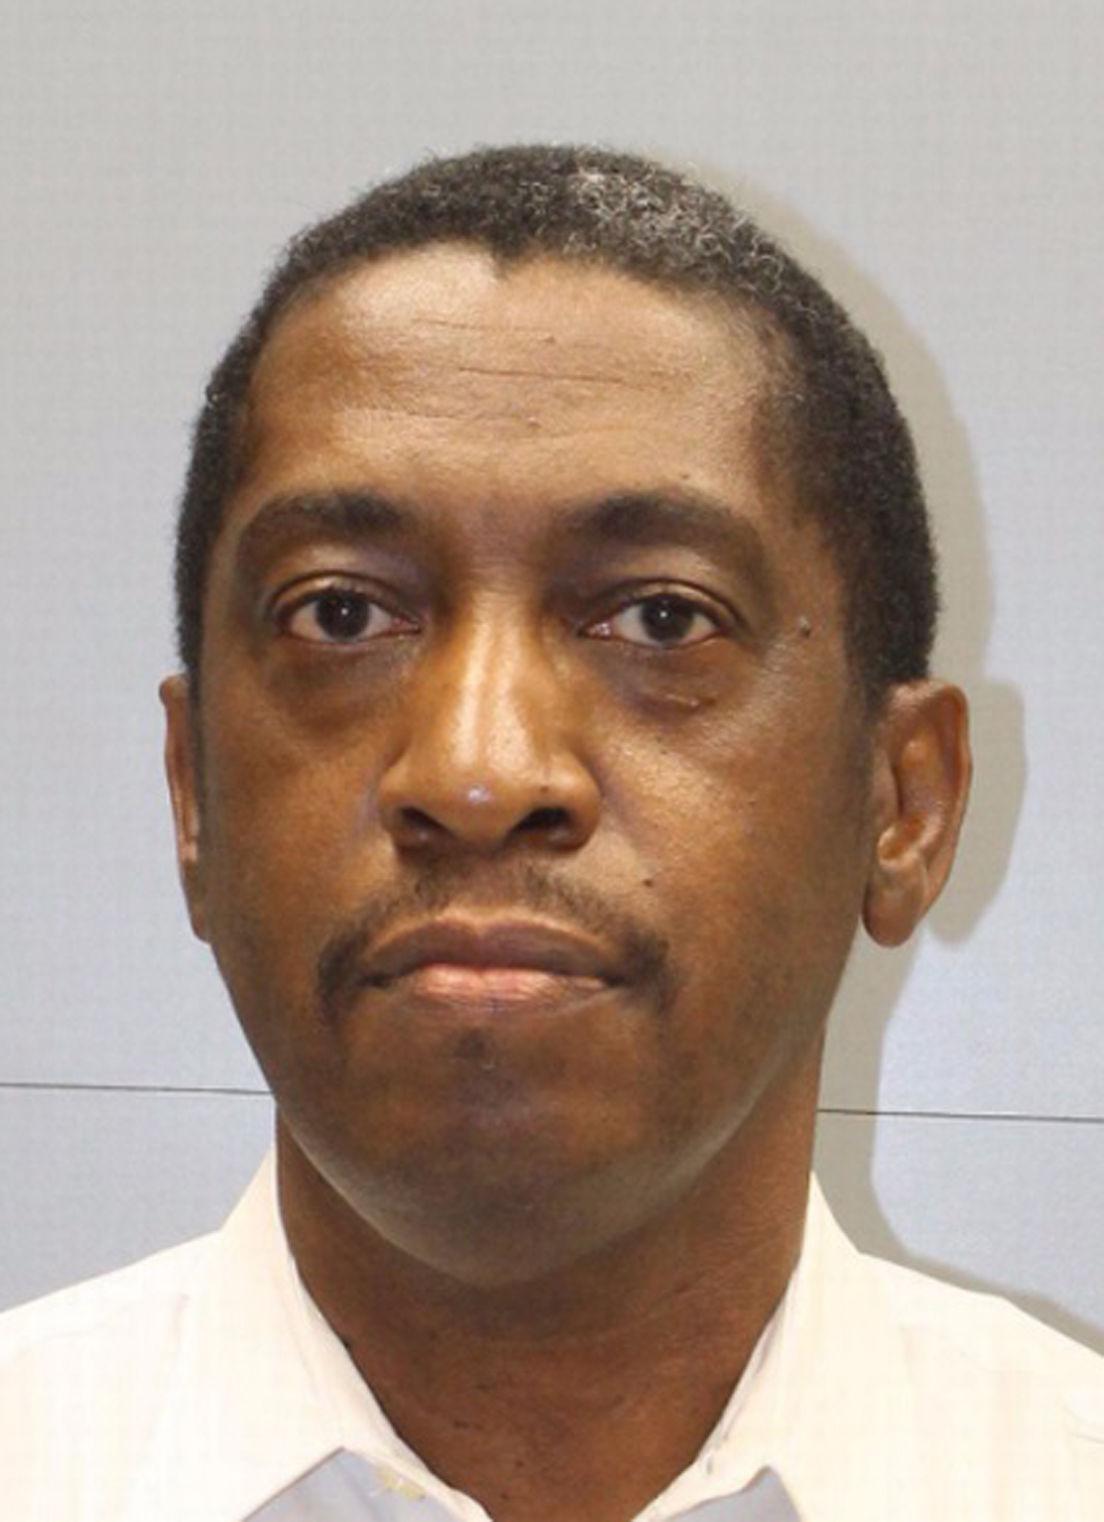 Jerry Govan, jail mugshot